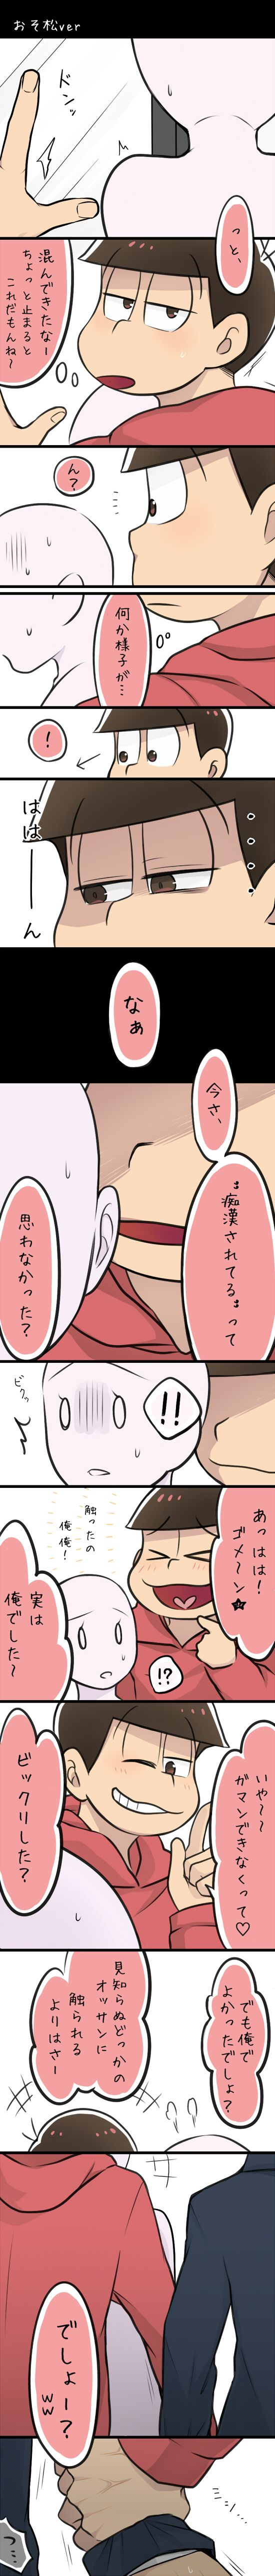 Osomatsu-san: Dealing with harassment (Osomatsu version pt. 1)